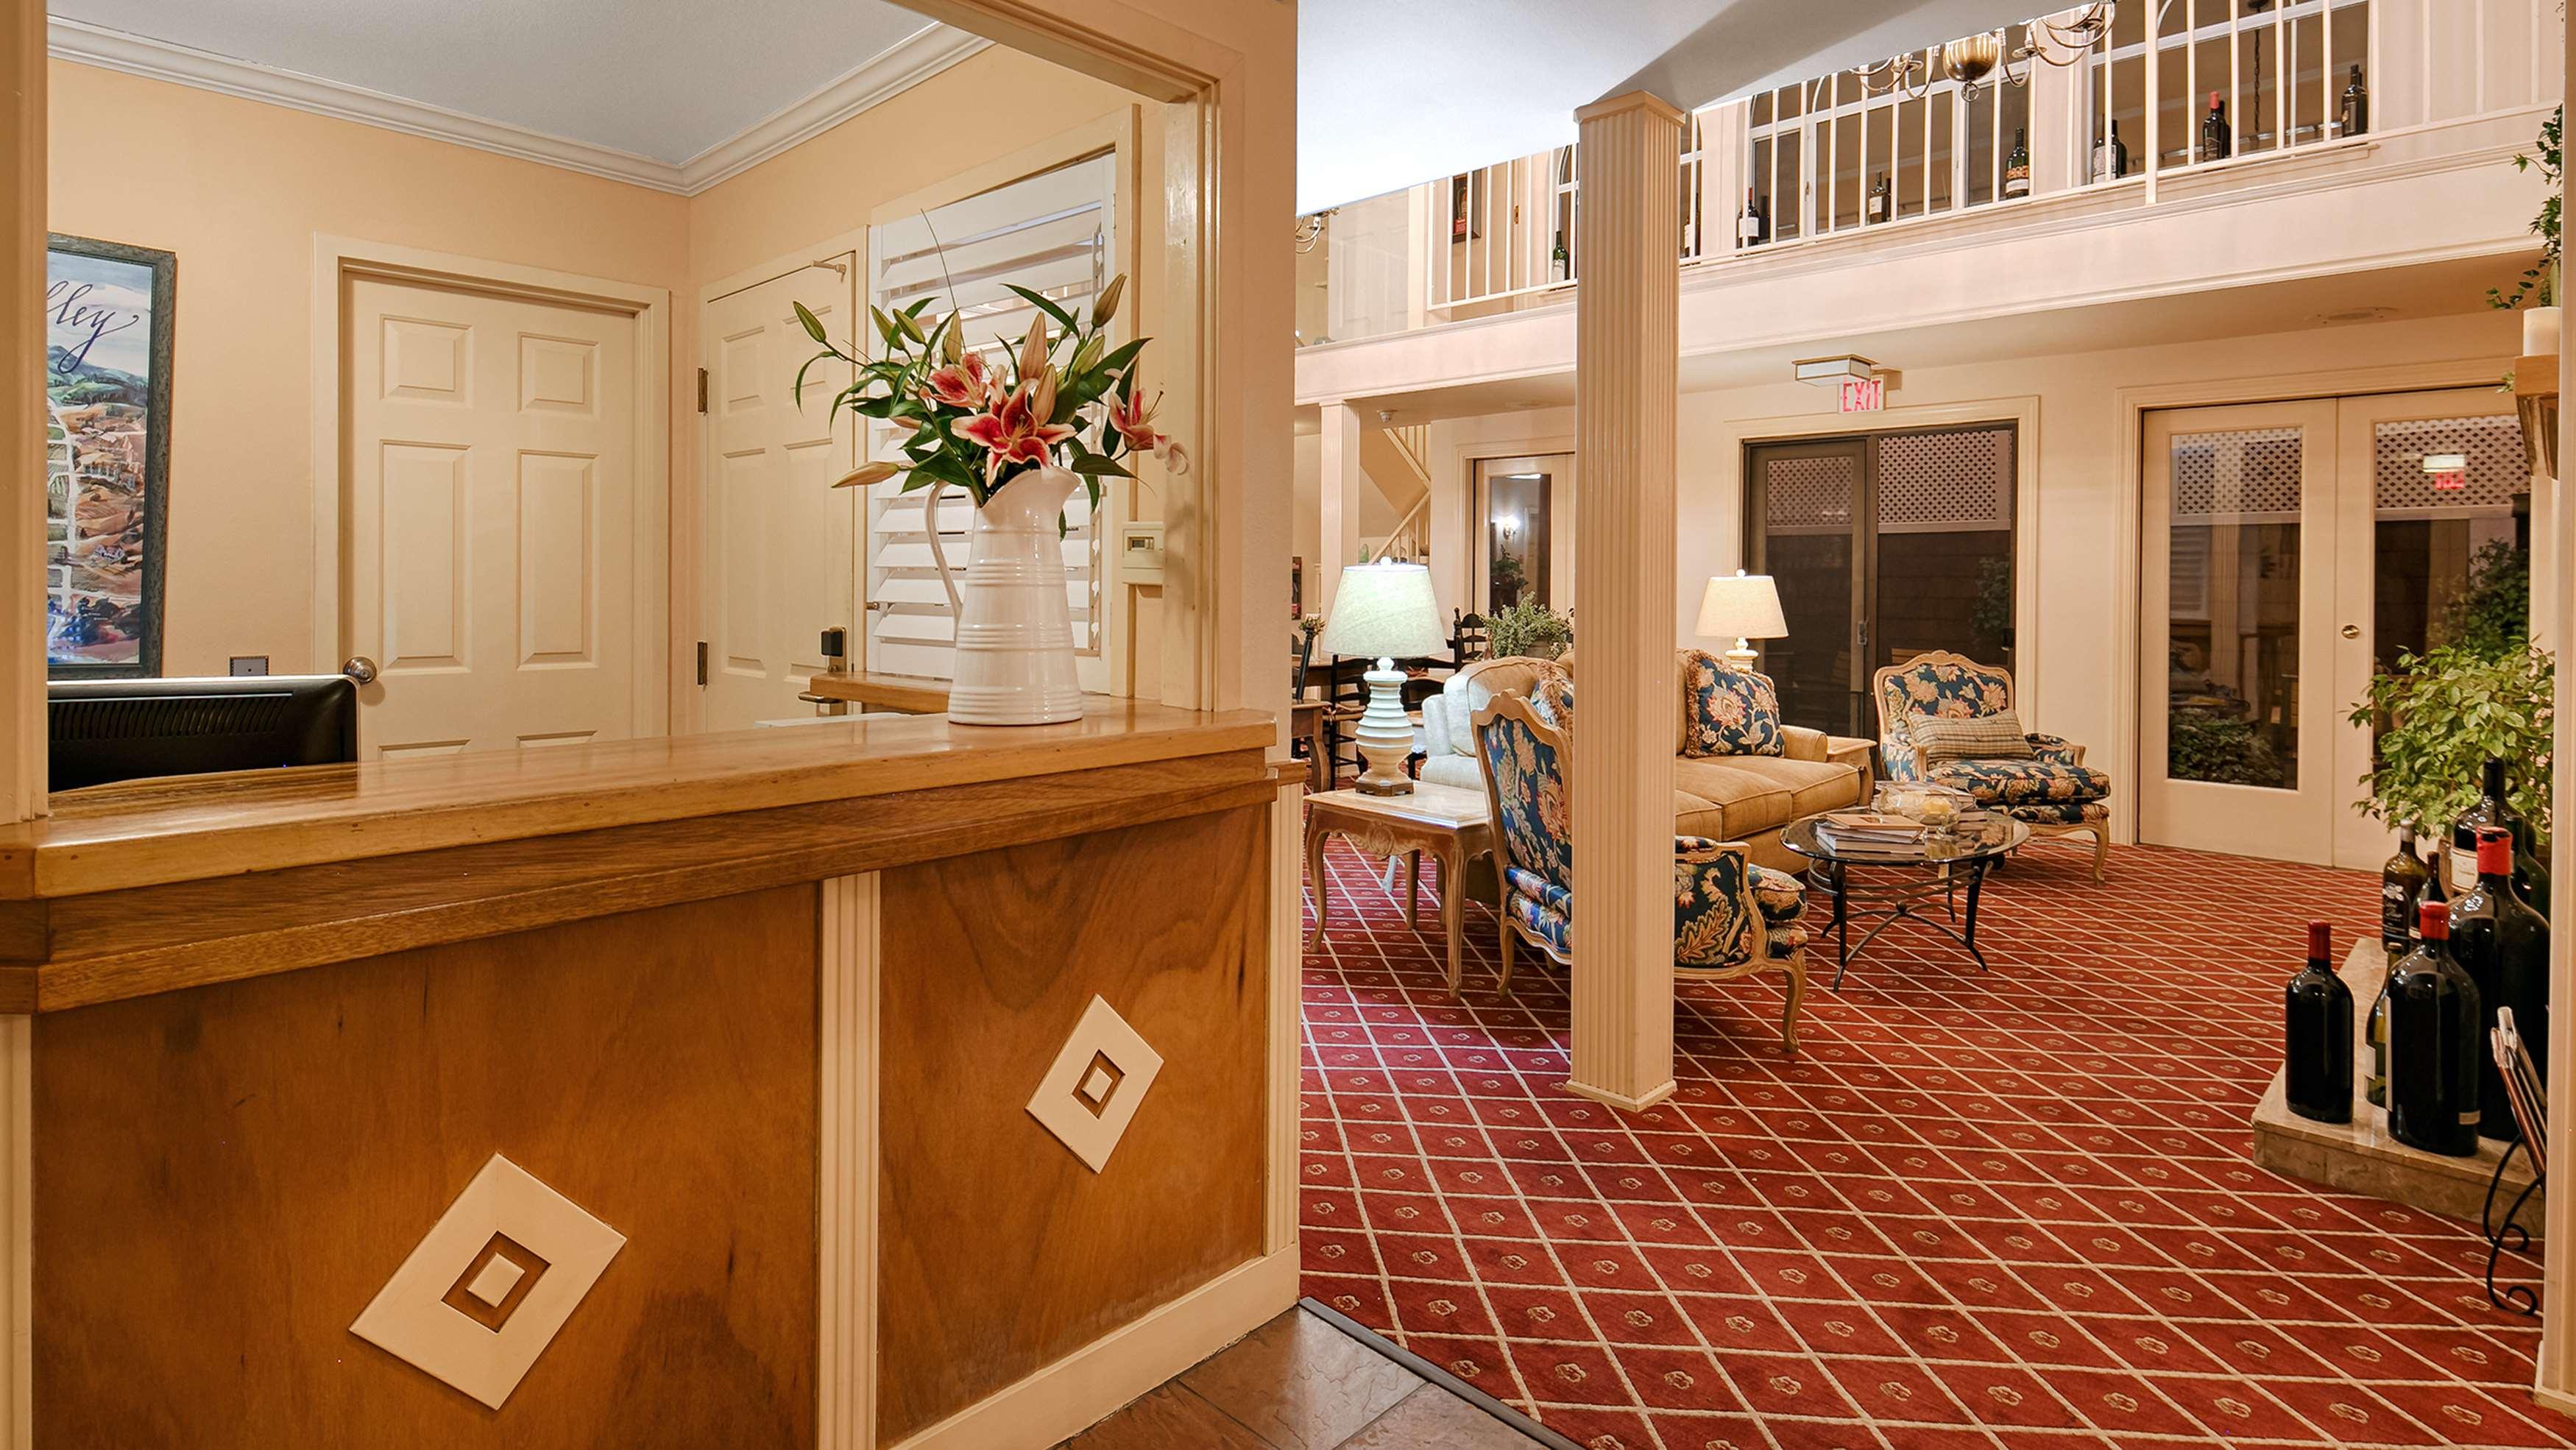 Best Western Plus Elm House Inn image 7